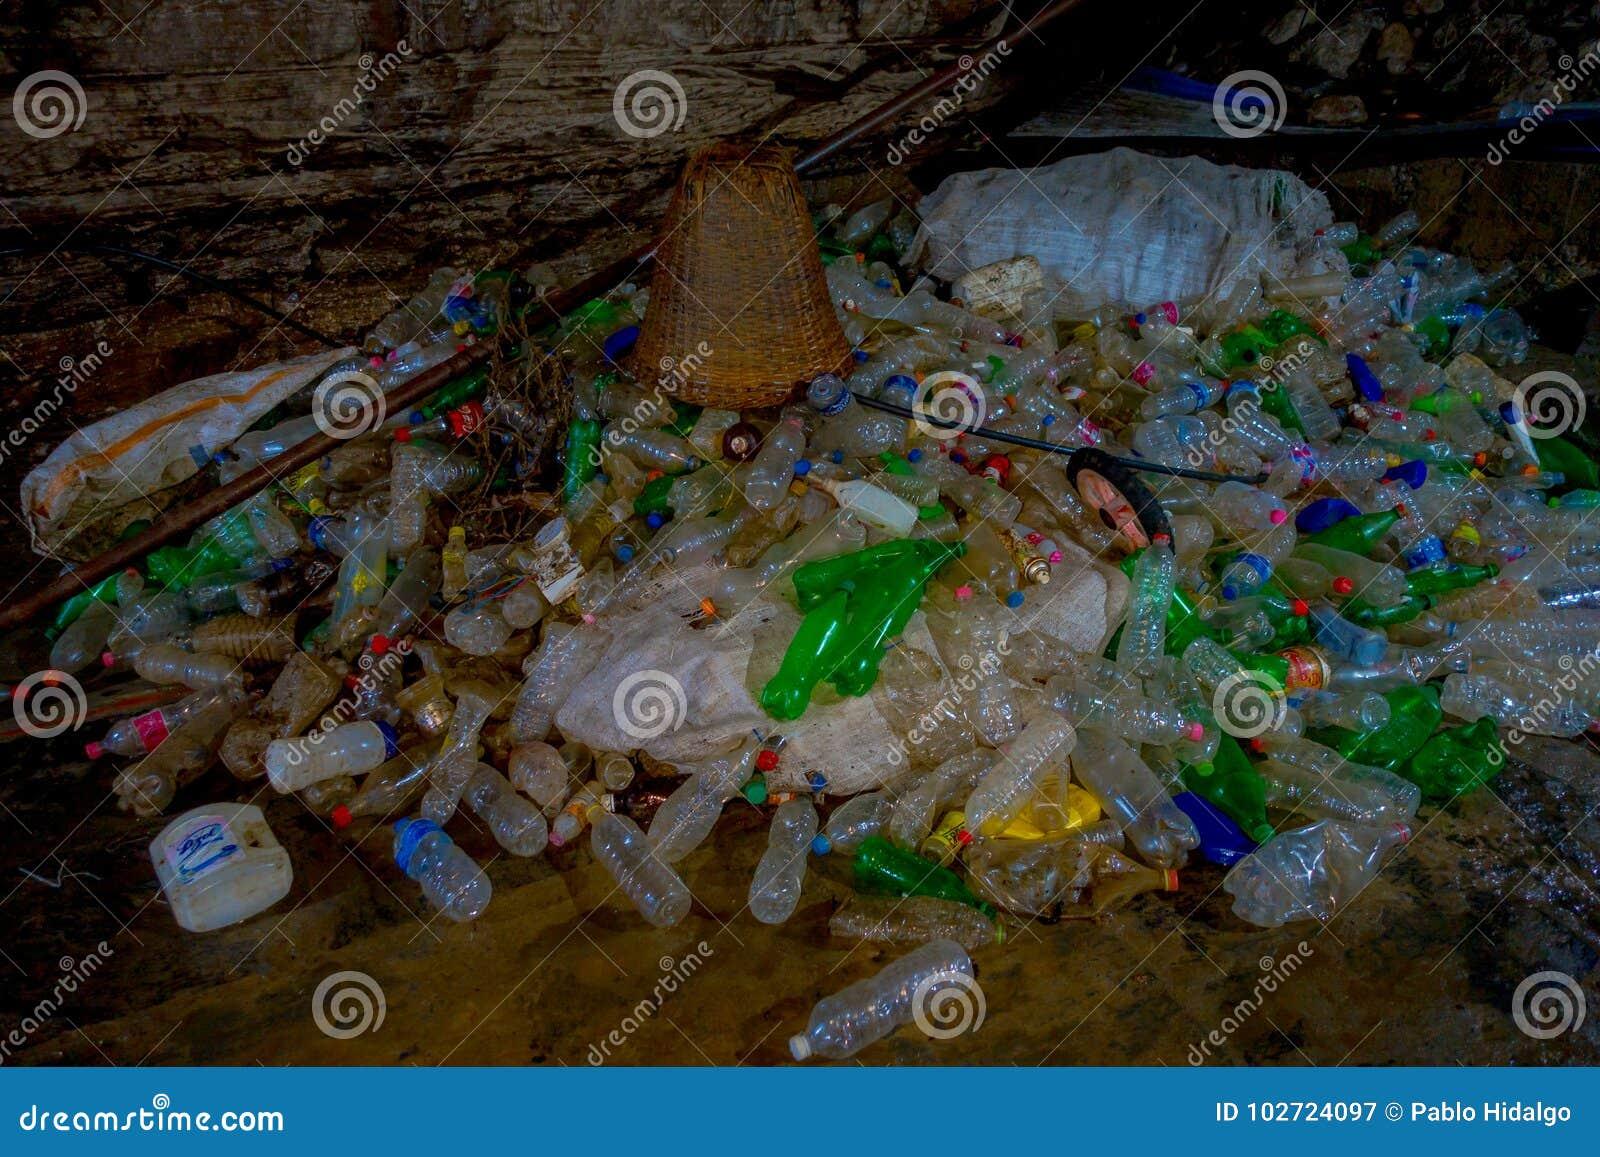 DEHRADUN, INDIA - NOVEMBER 07, 2015: Close up of garbage with plastic bottles, baskets, sacks in Tapkeshwar Mahadev